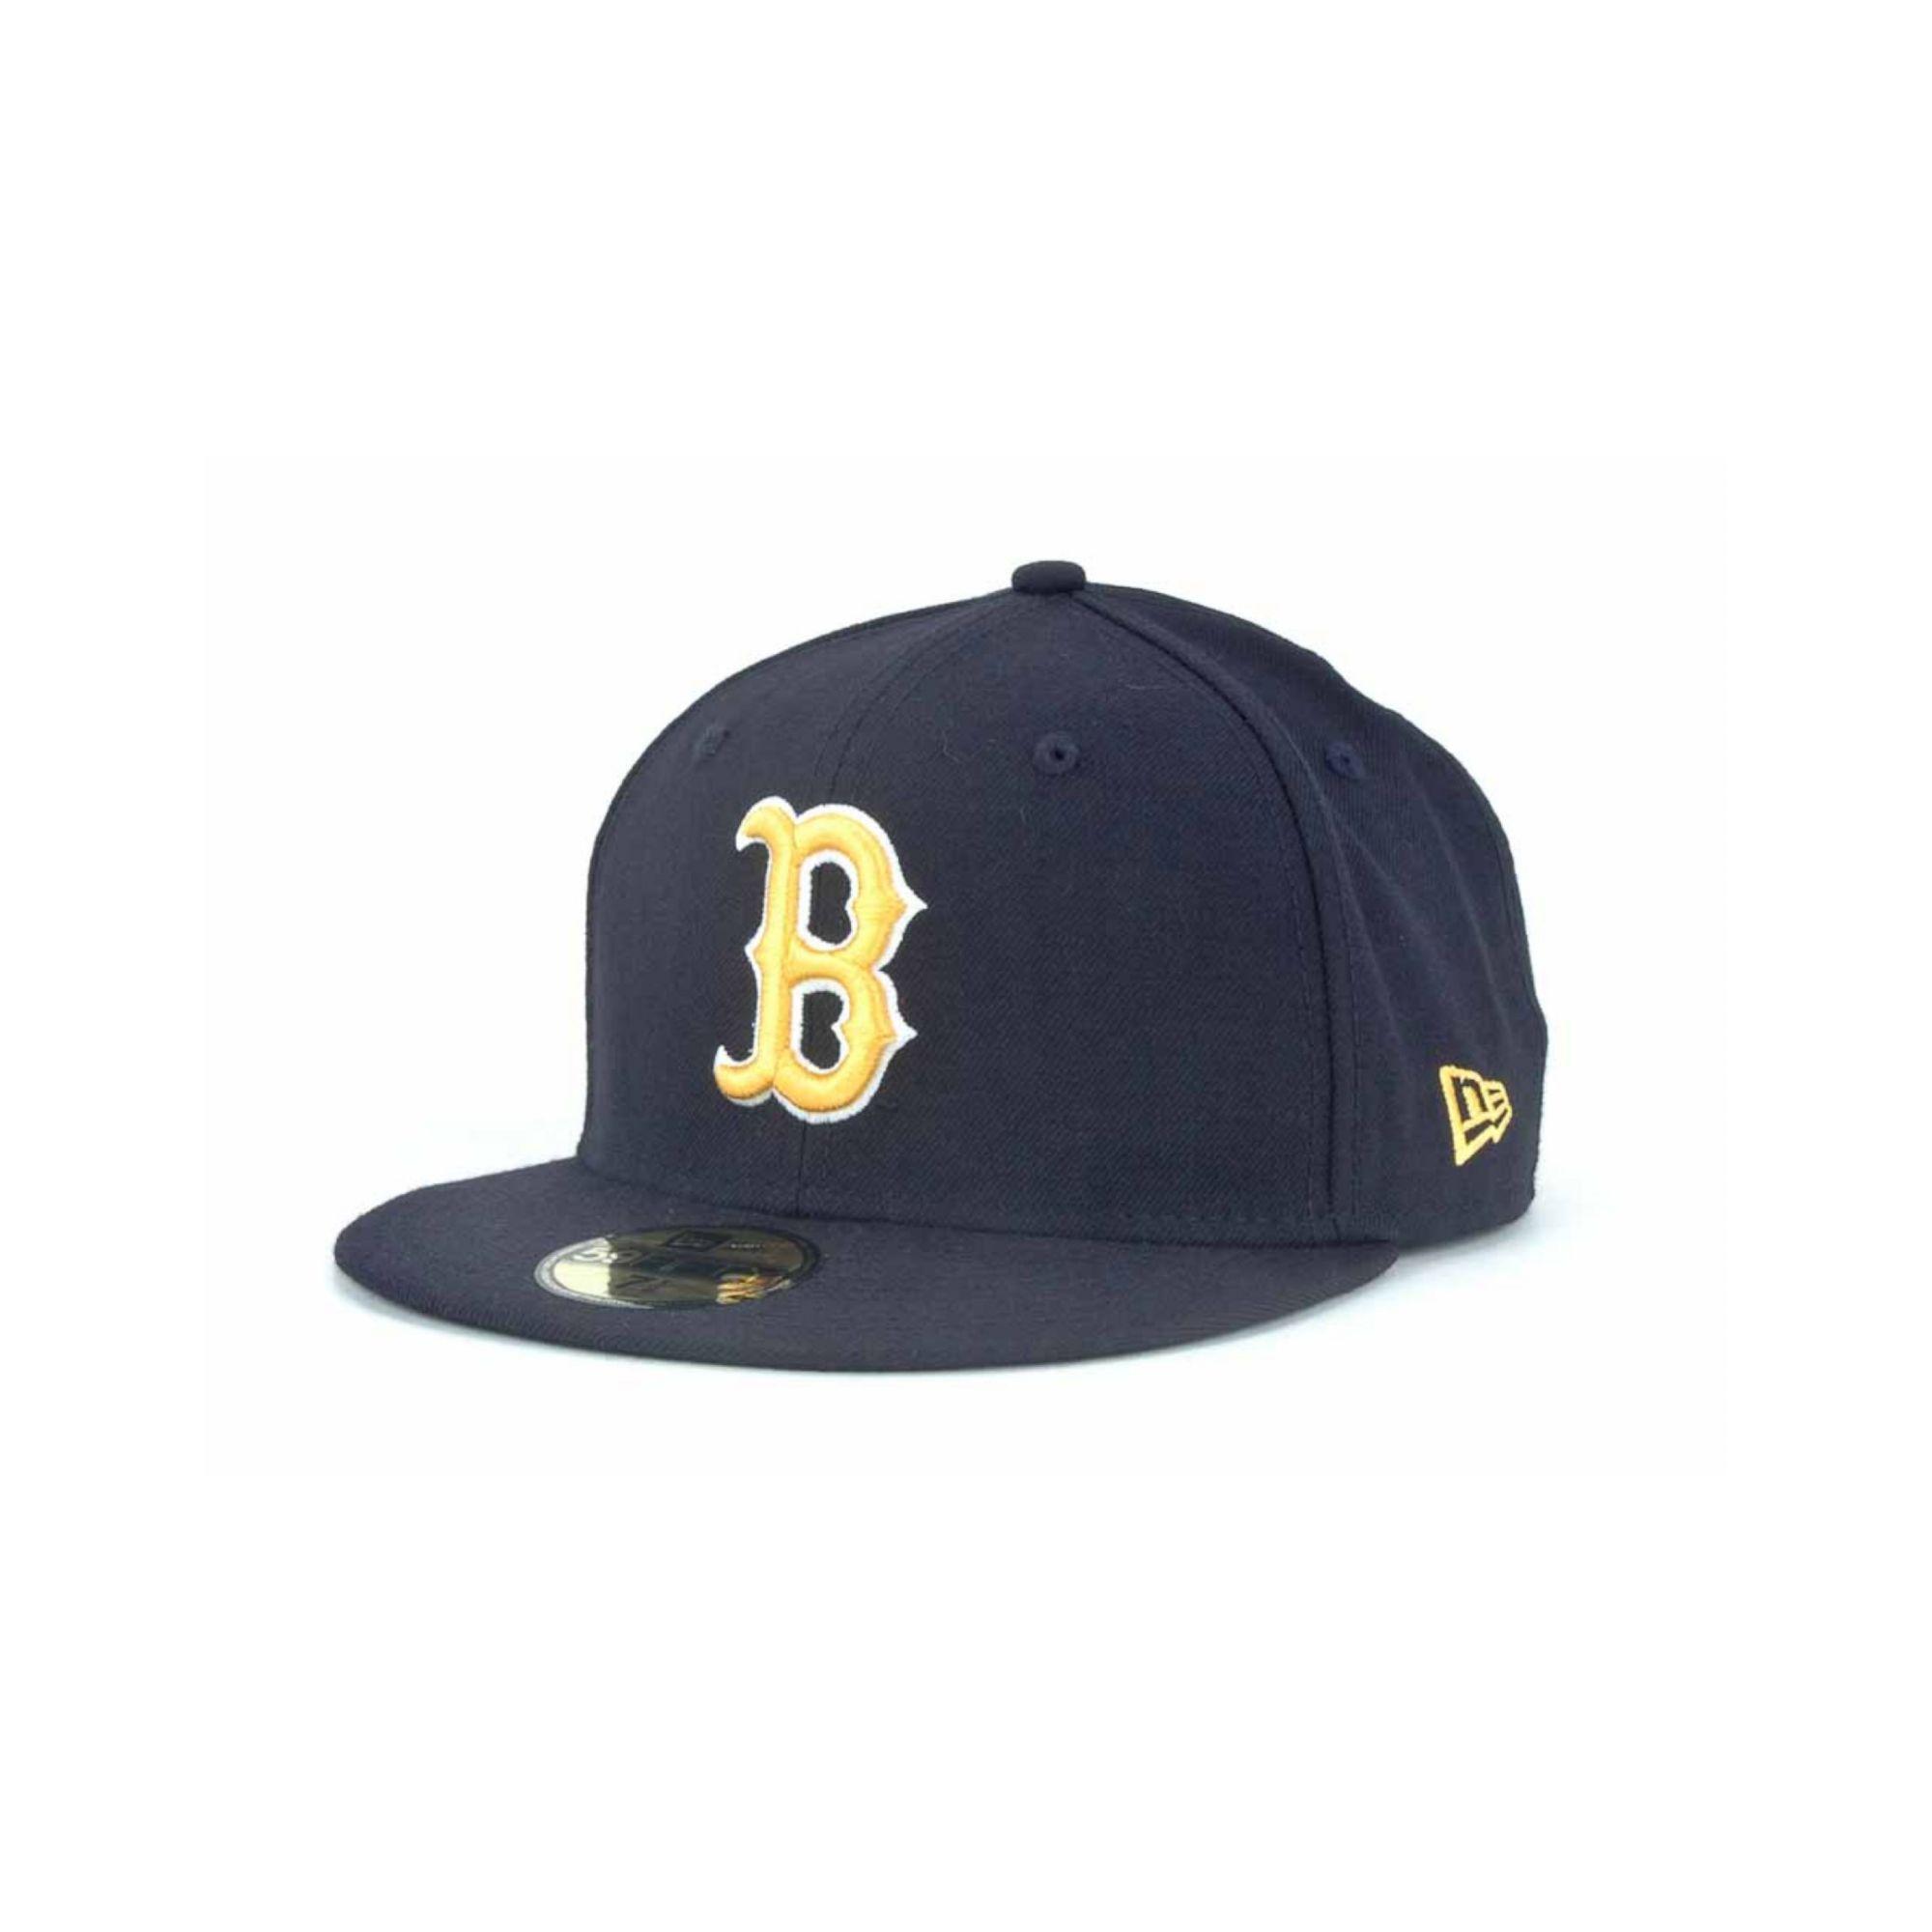 buy online c9e74 02840 KTZ Ucla Bruins 59fifty Cap in Blue for Men - Lyst